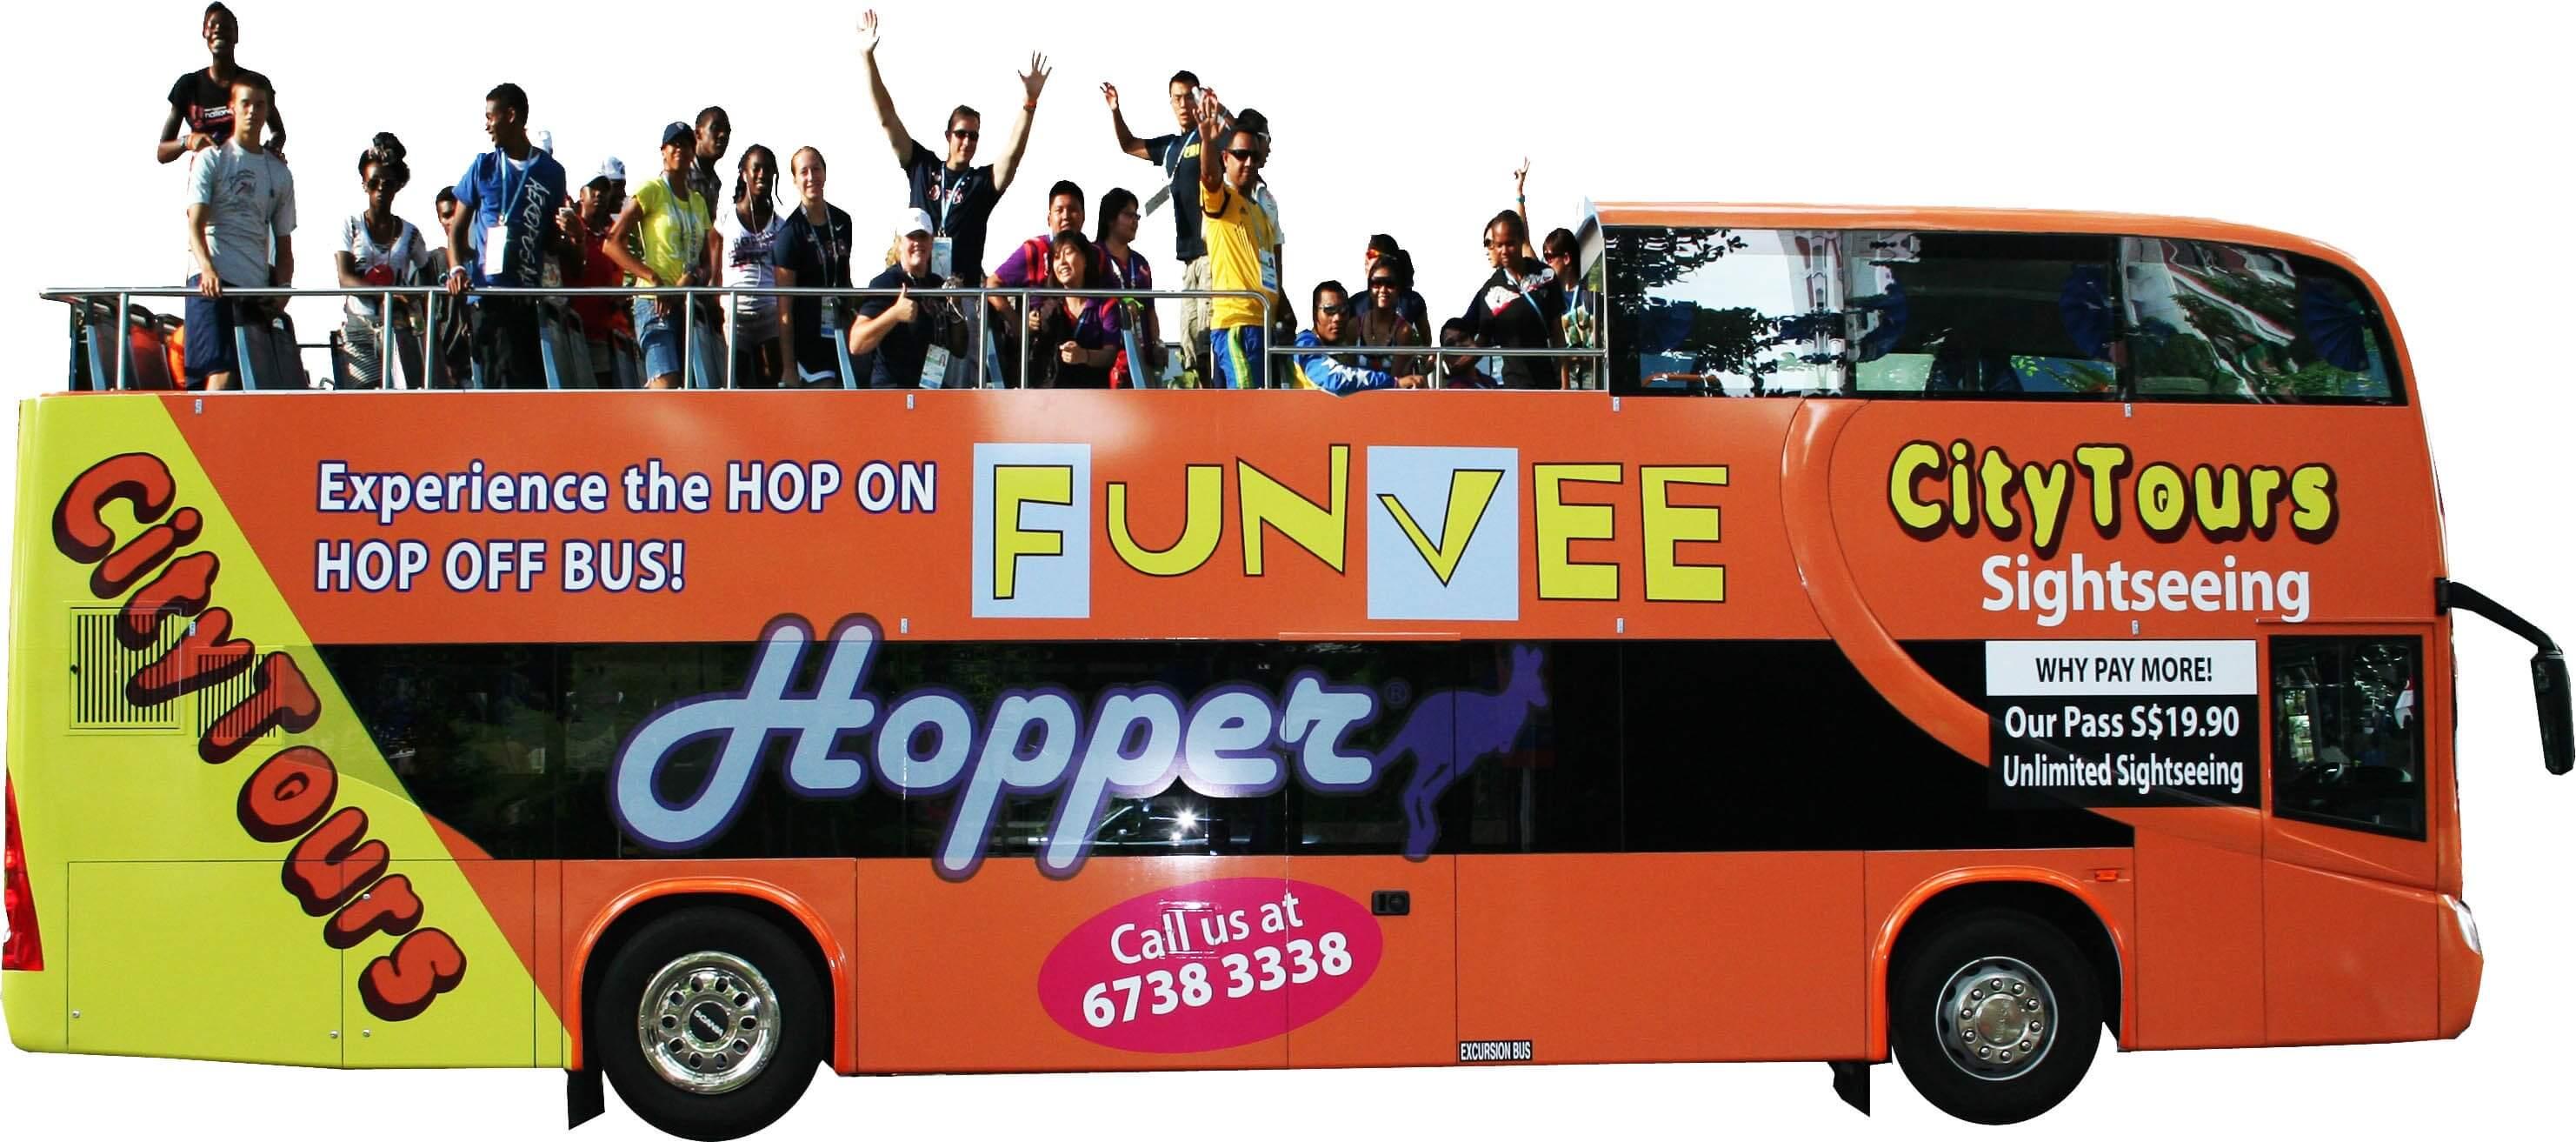 funvee-bus-tour